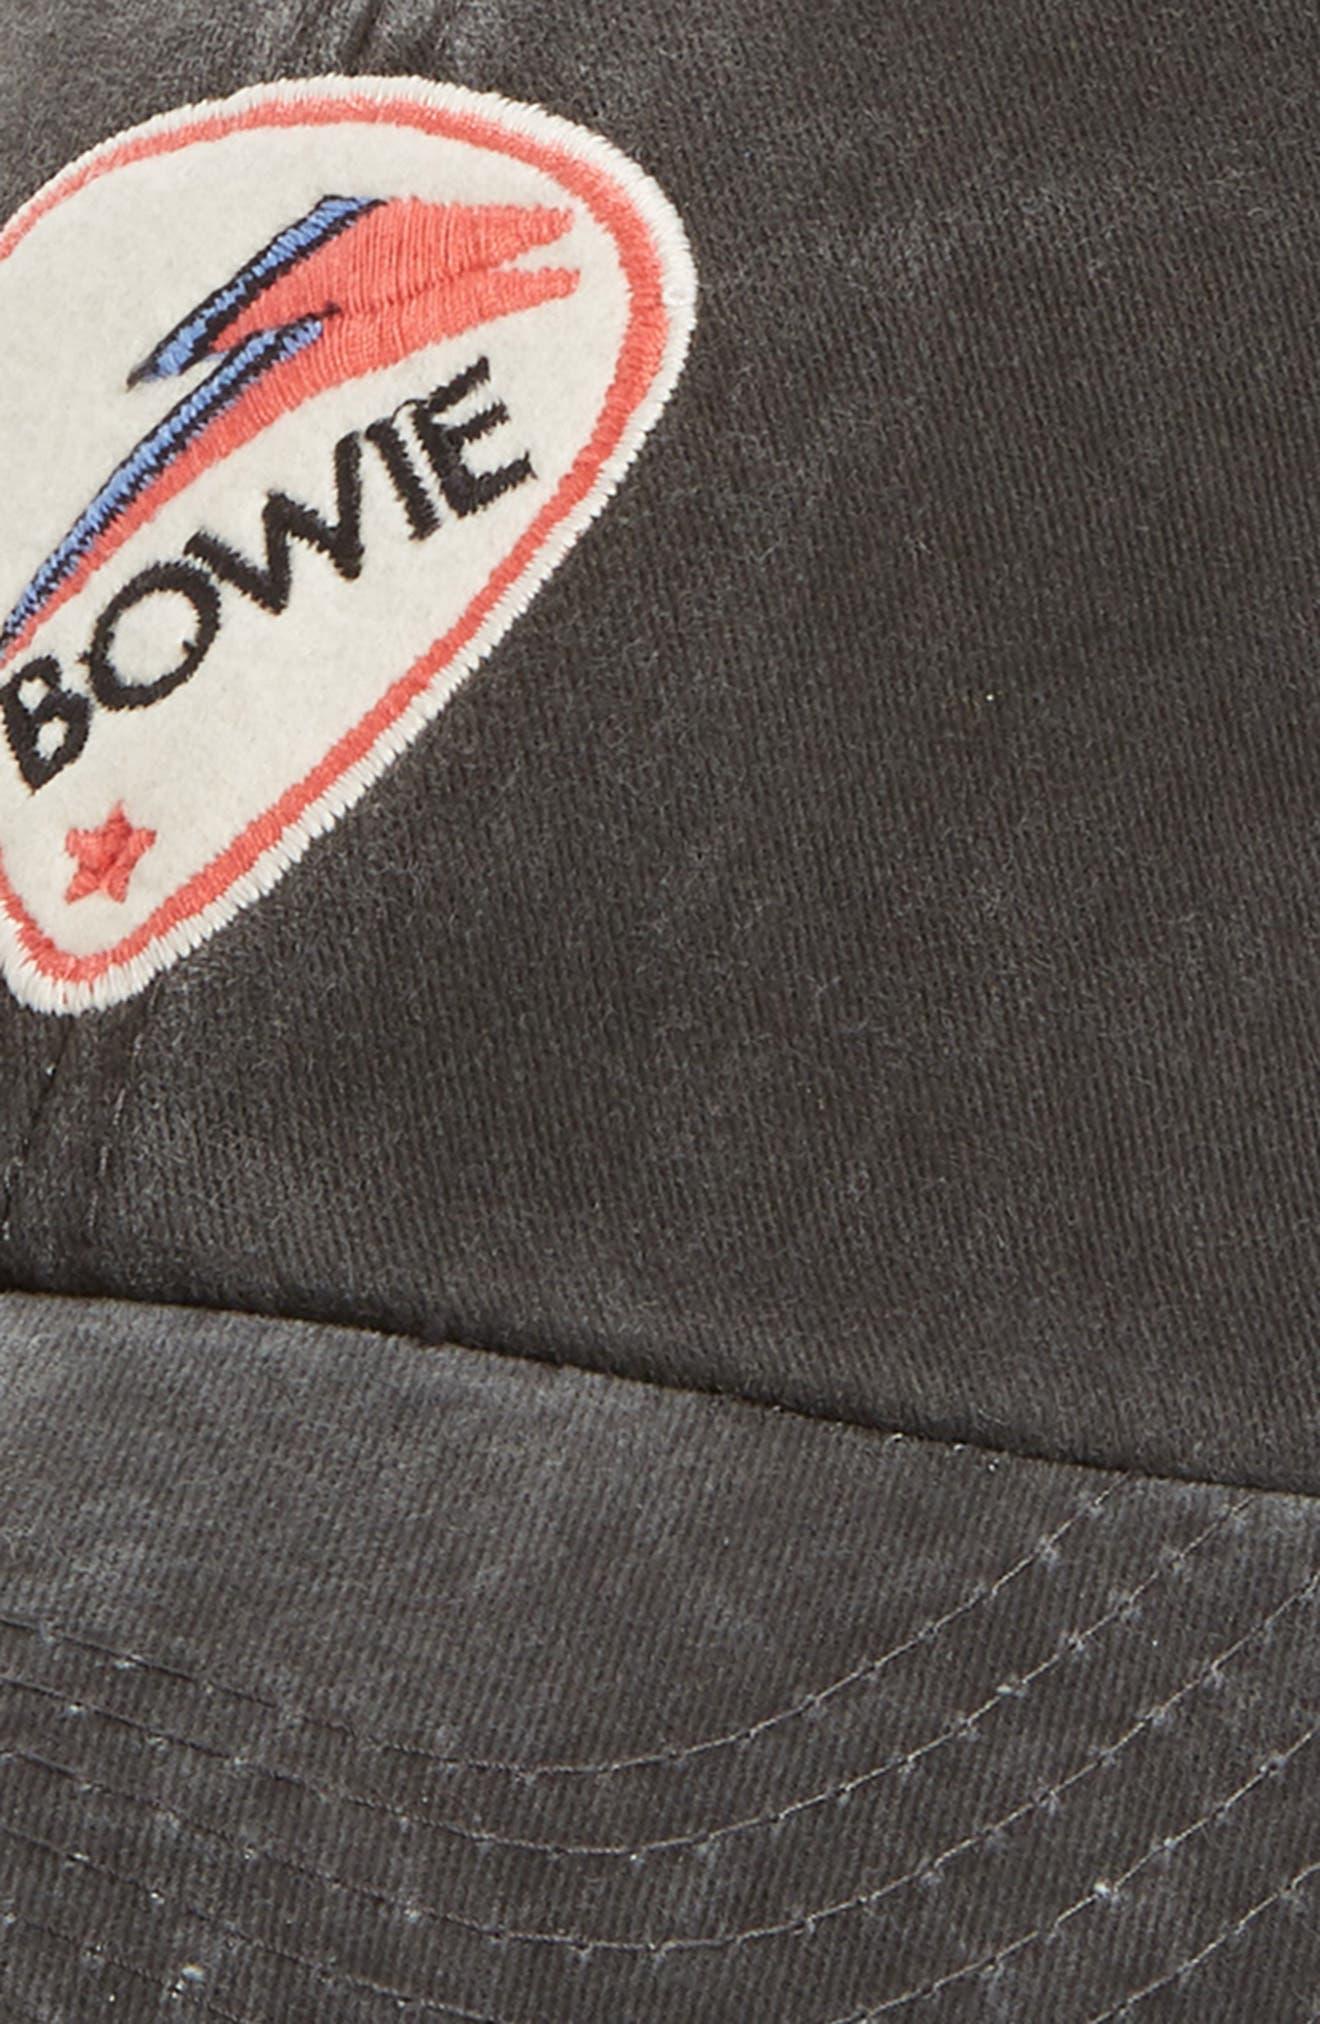 Raglan Bones Bowie Ball Cap,                             Alternate thumbnail 3, color,                             Black